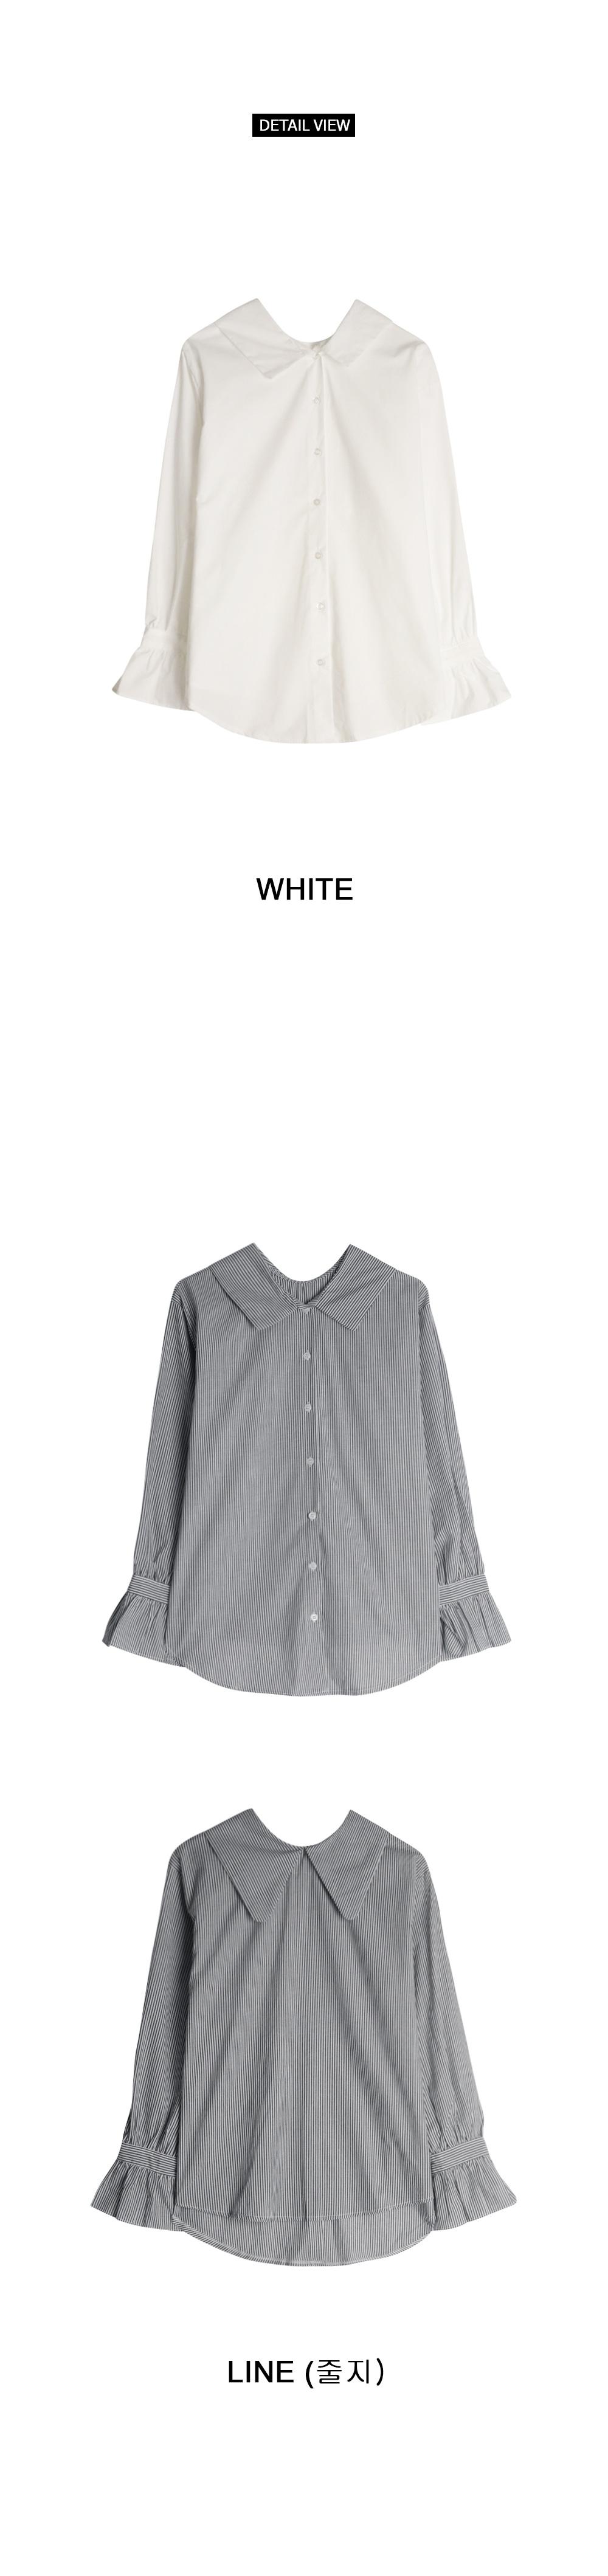 Two-way round collar shirt